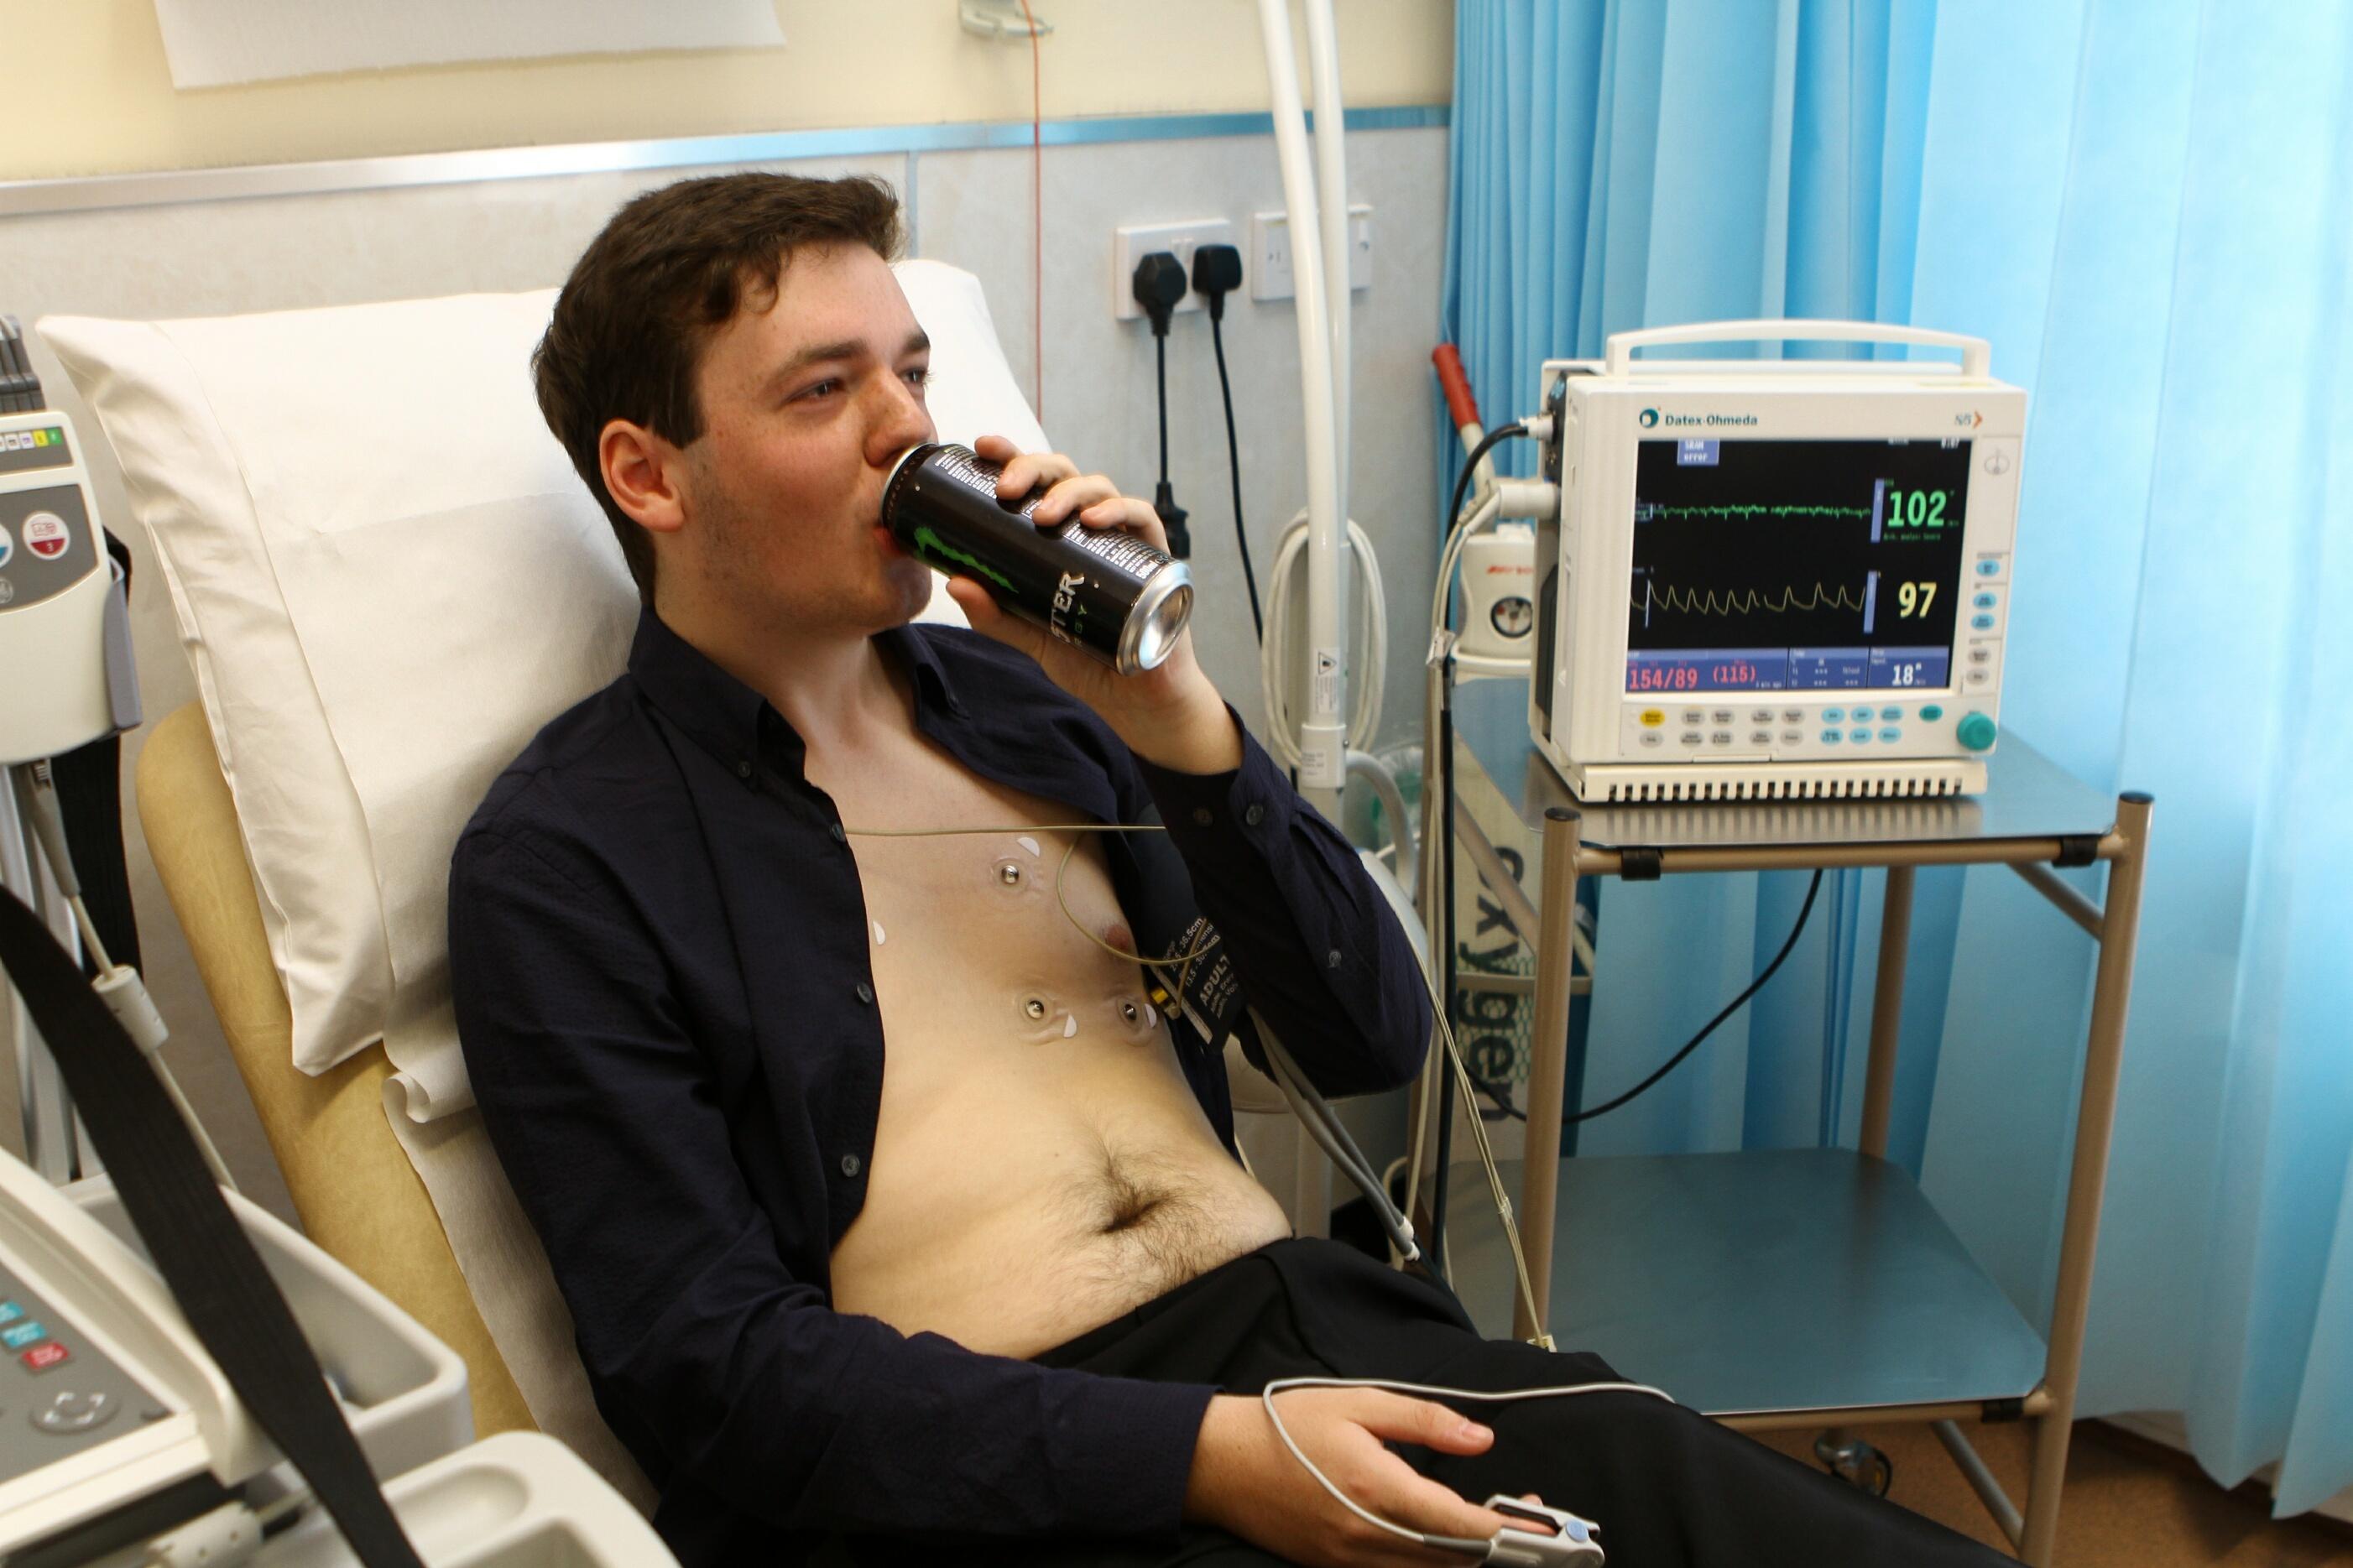 Ciaran Sneddon has an energy drink.